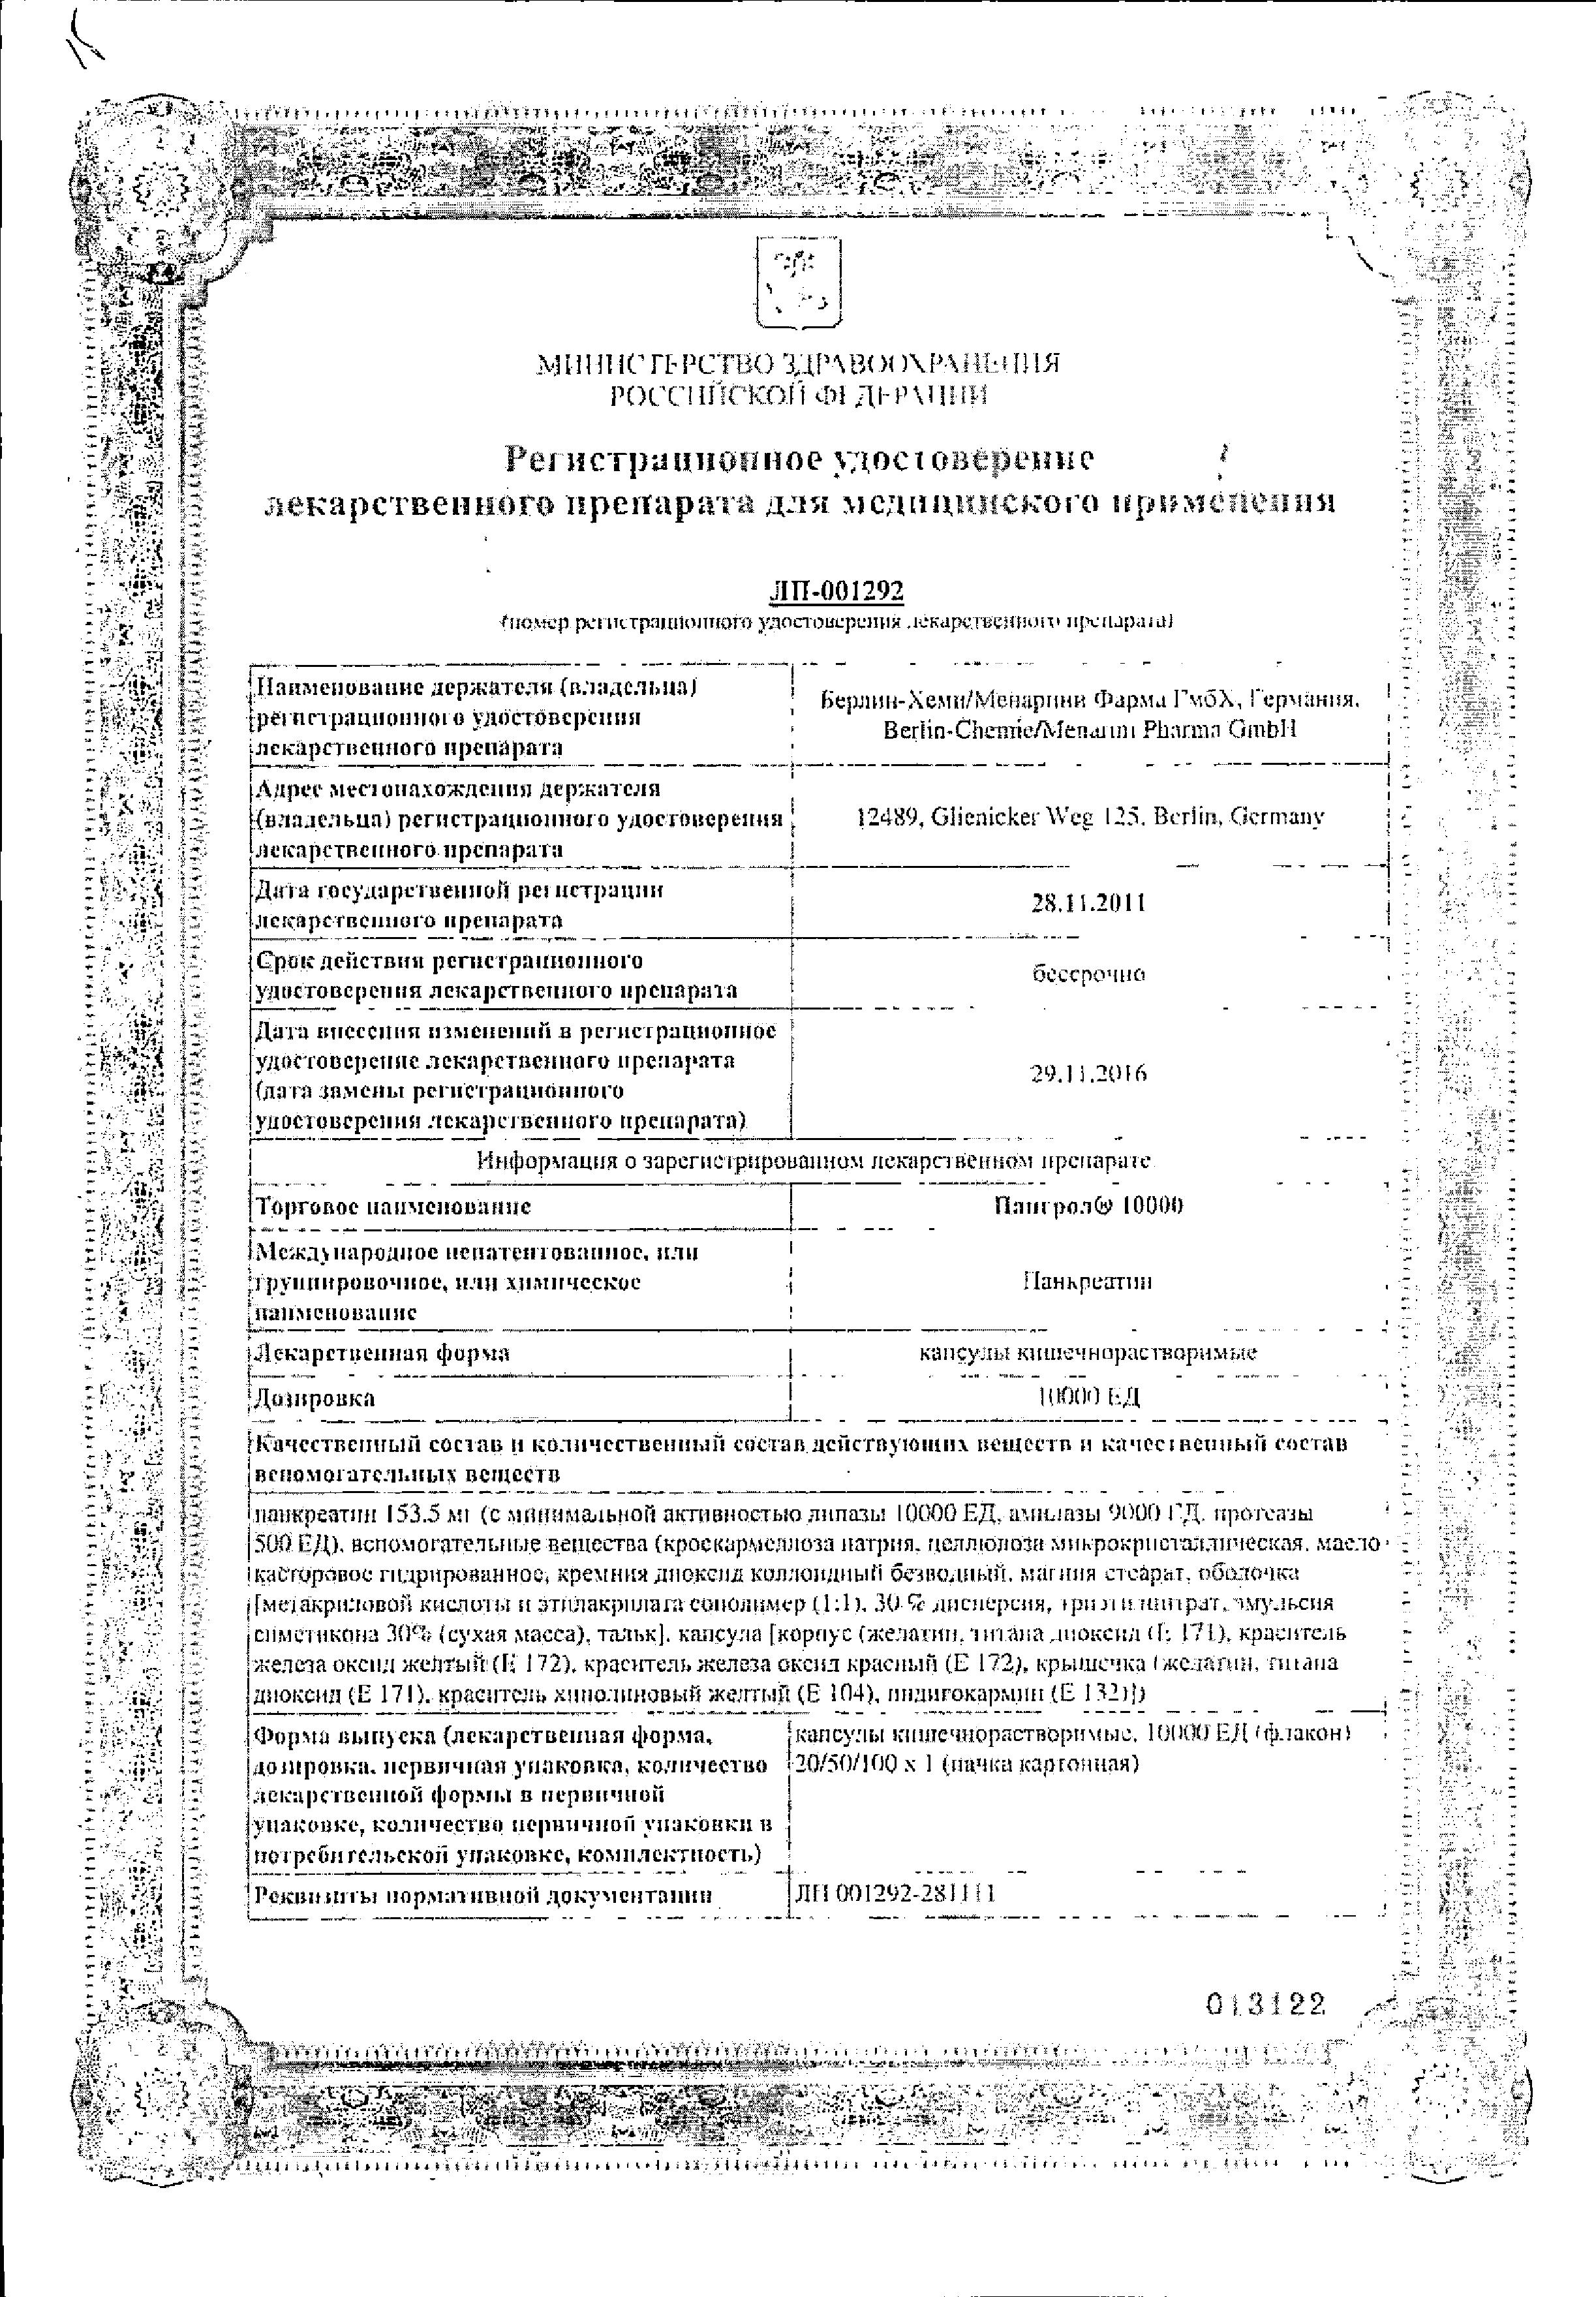 Пангрол 10000 сертификат